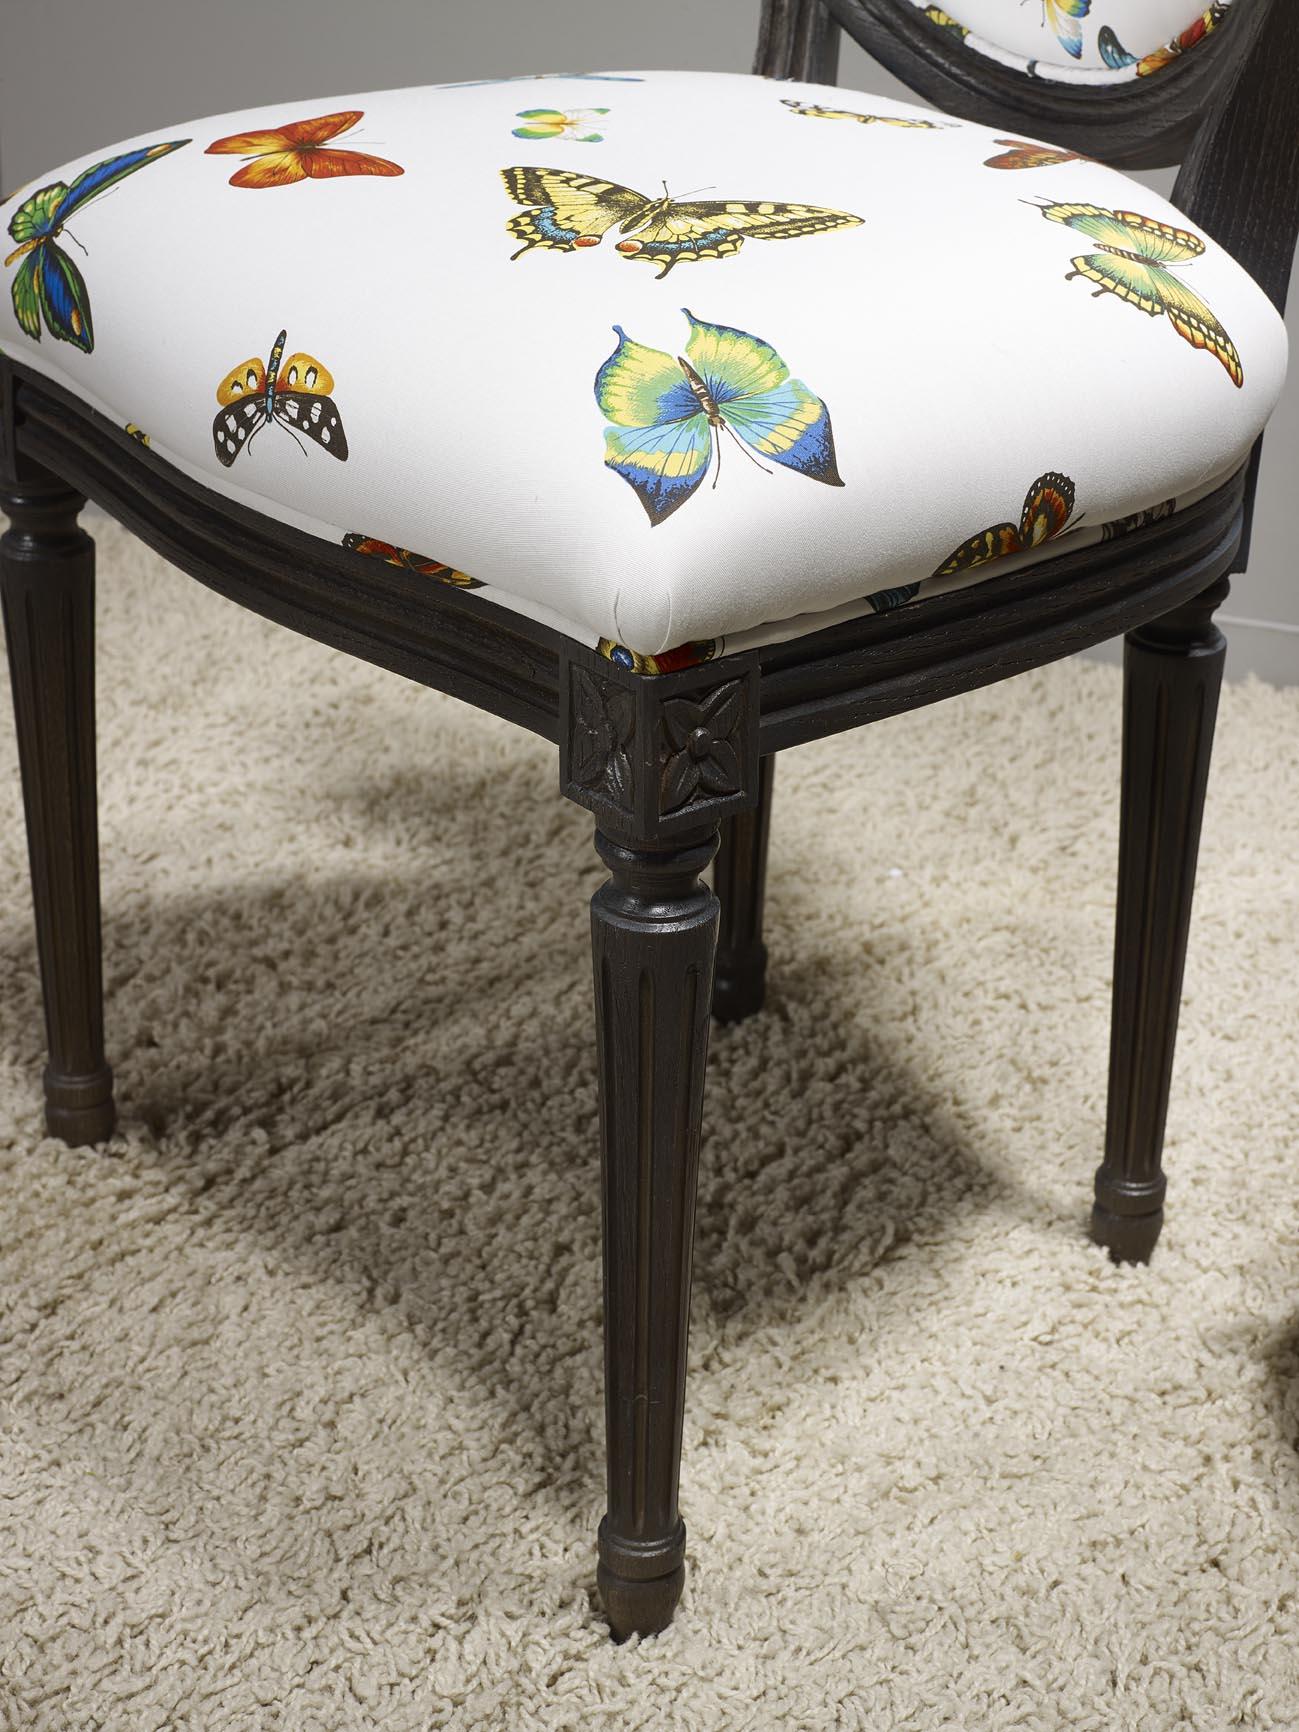 #A06A2B Chaise En Chêne Massif De Style Louis XVI Finition Chêne  4247 chaise de salle a manger en chene massif recouvert de tissu 1299x1732 px @ aertt.com